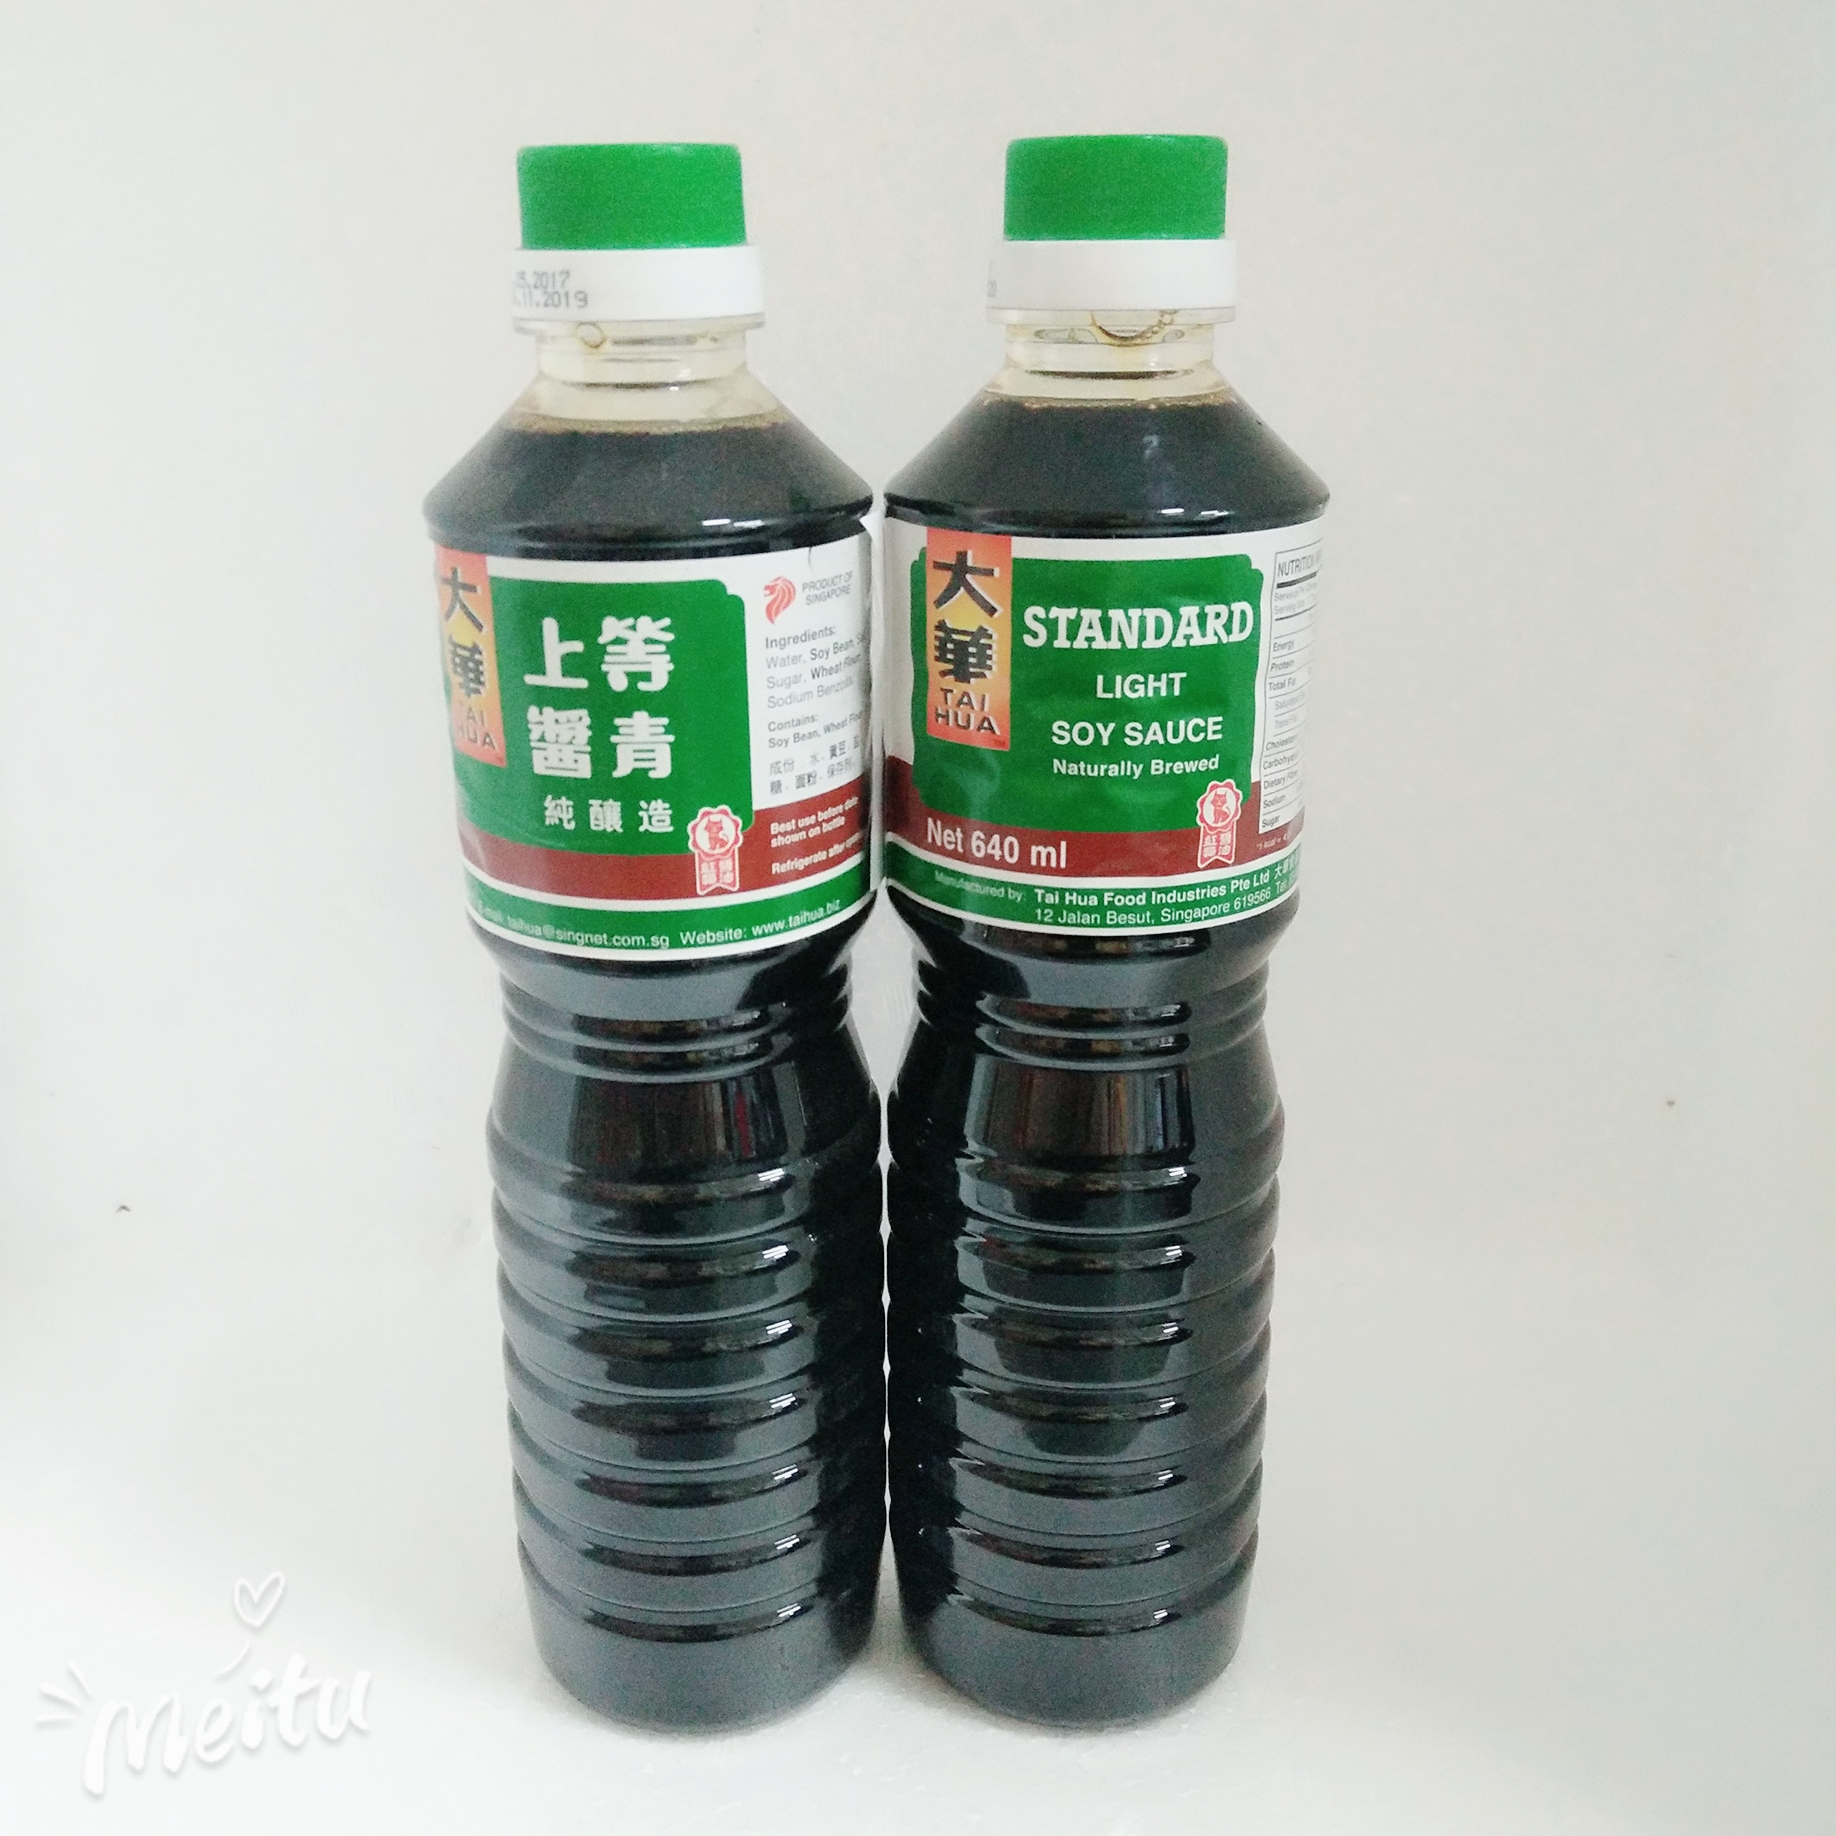 Image Light Soy Sauce  大华 - 上等酱青 640 grams